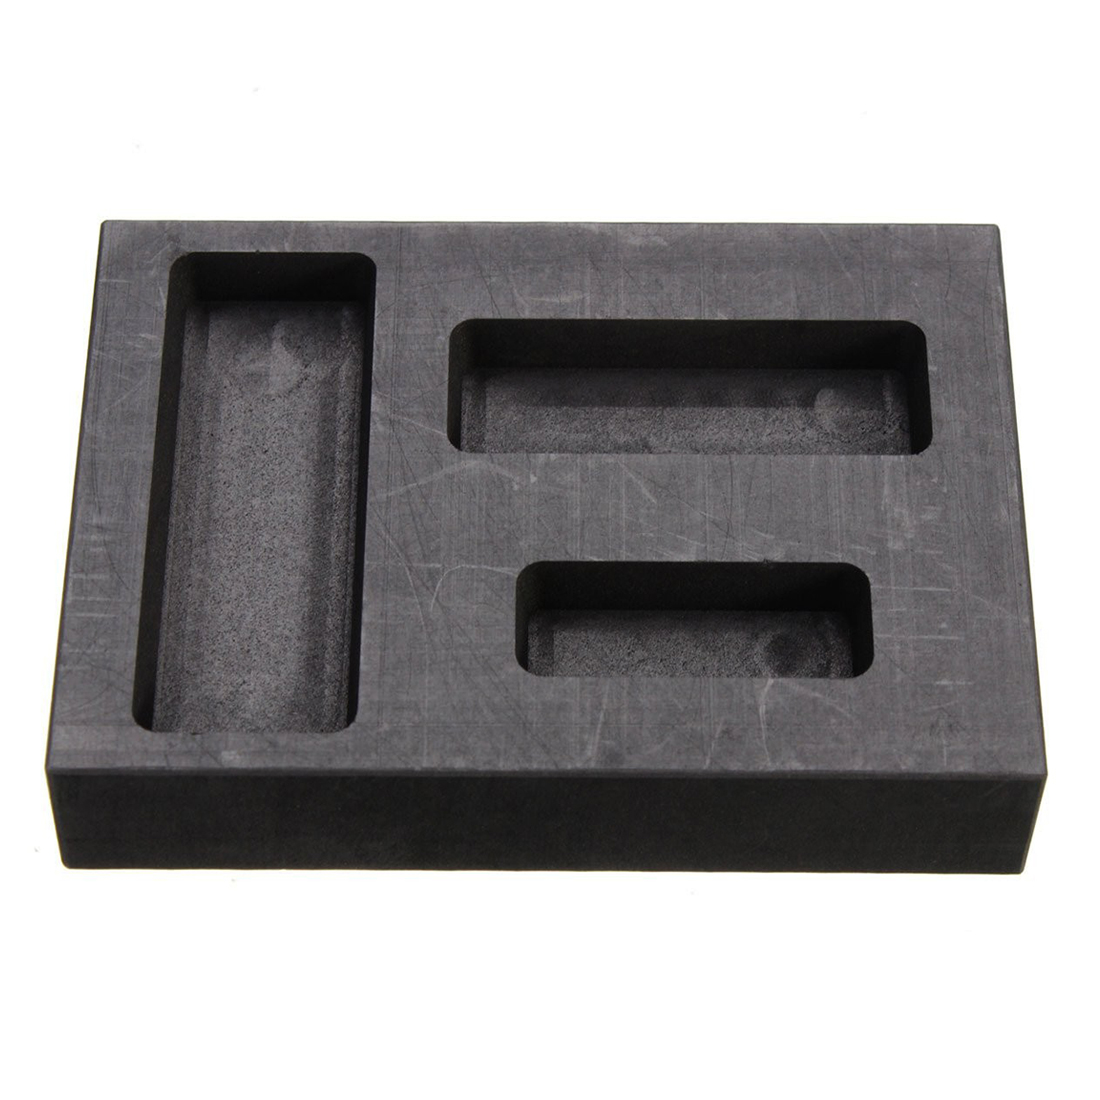 Silber Graphit Barren Bar Combo Form Schmelzen Casting Raffination Schrott